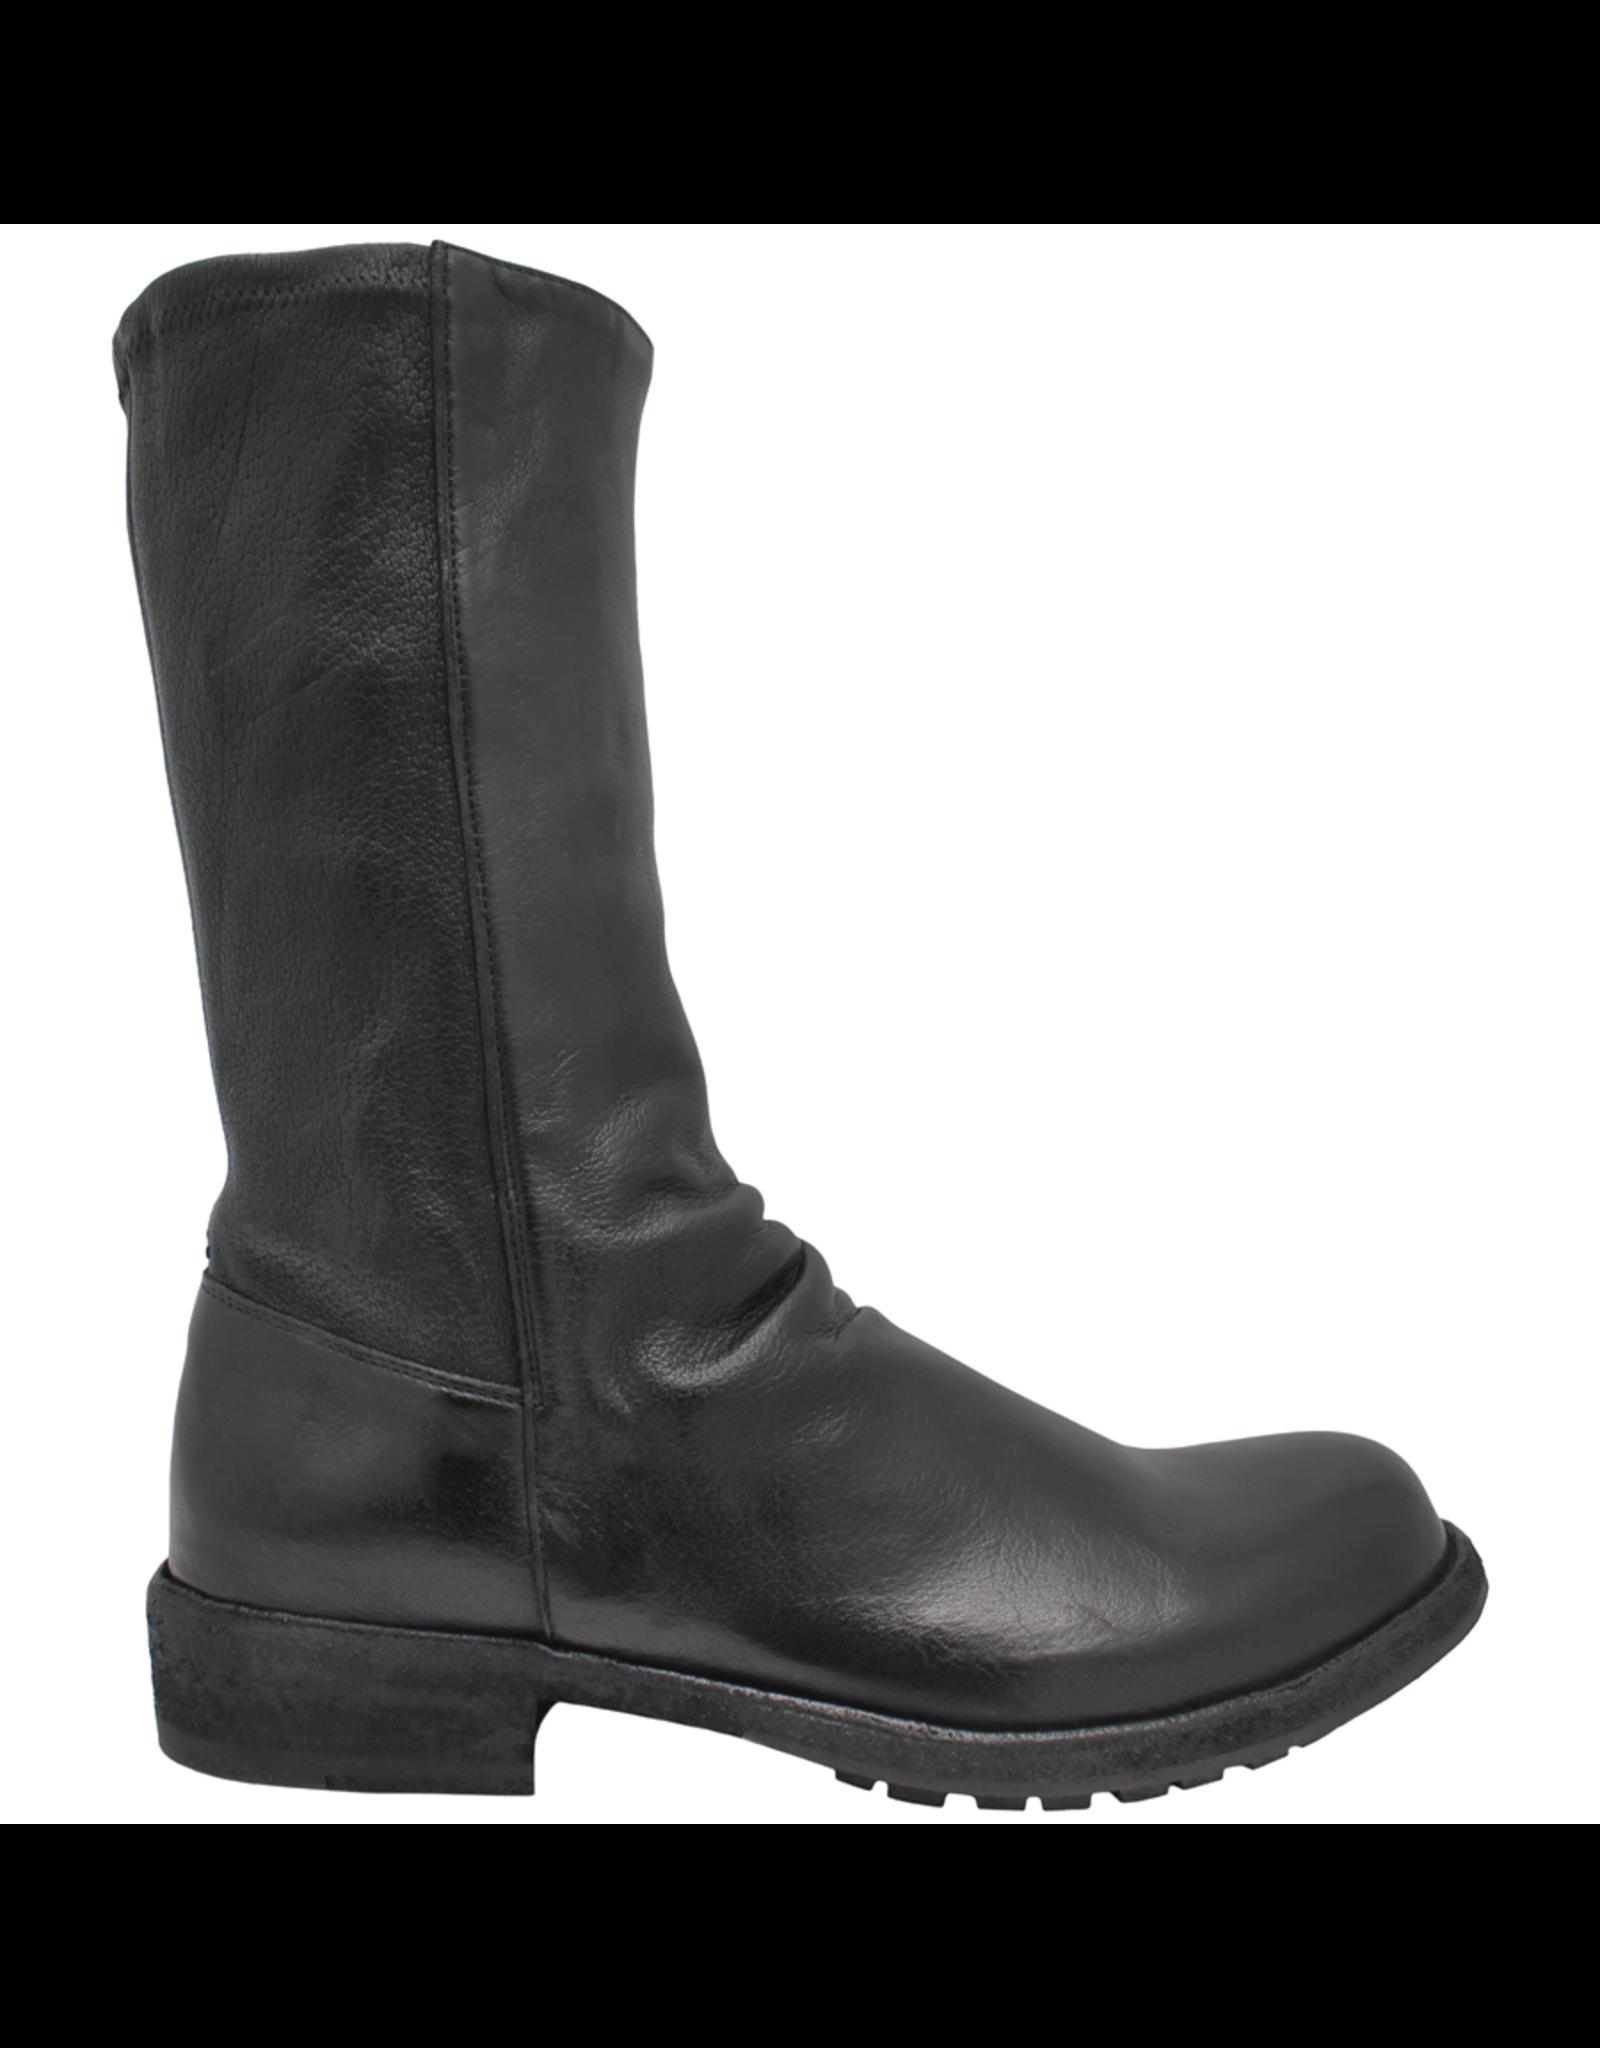 Officine Creative OfficineCreative Black Flat Mid-Calf Boot Legrand